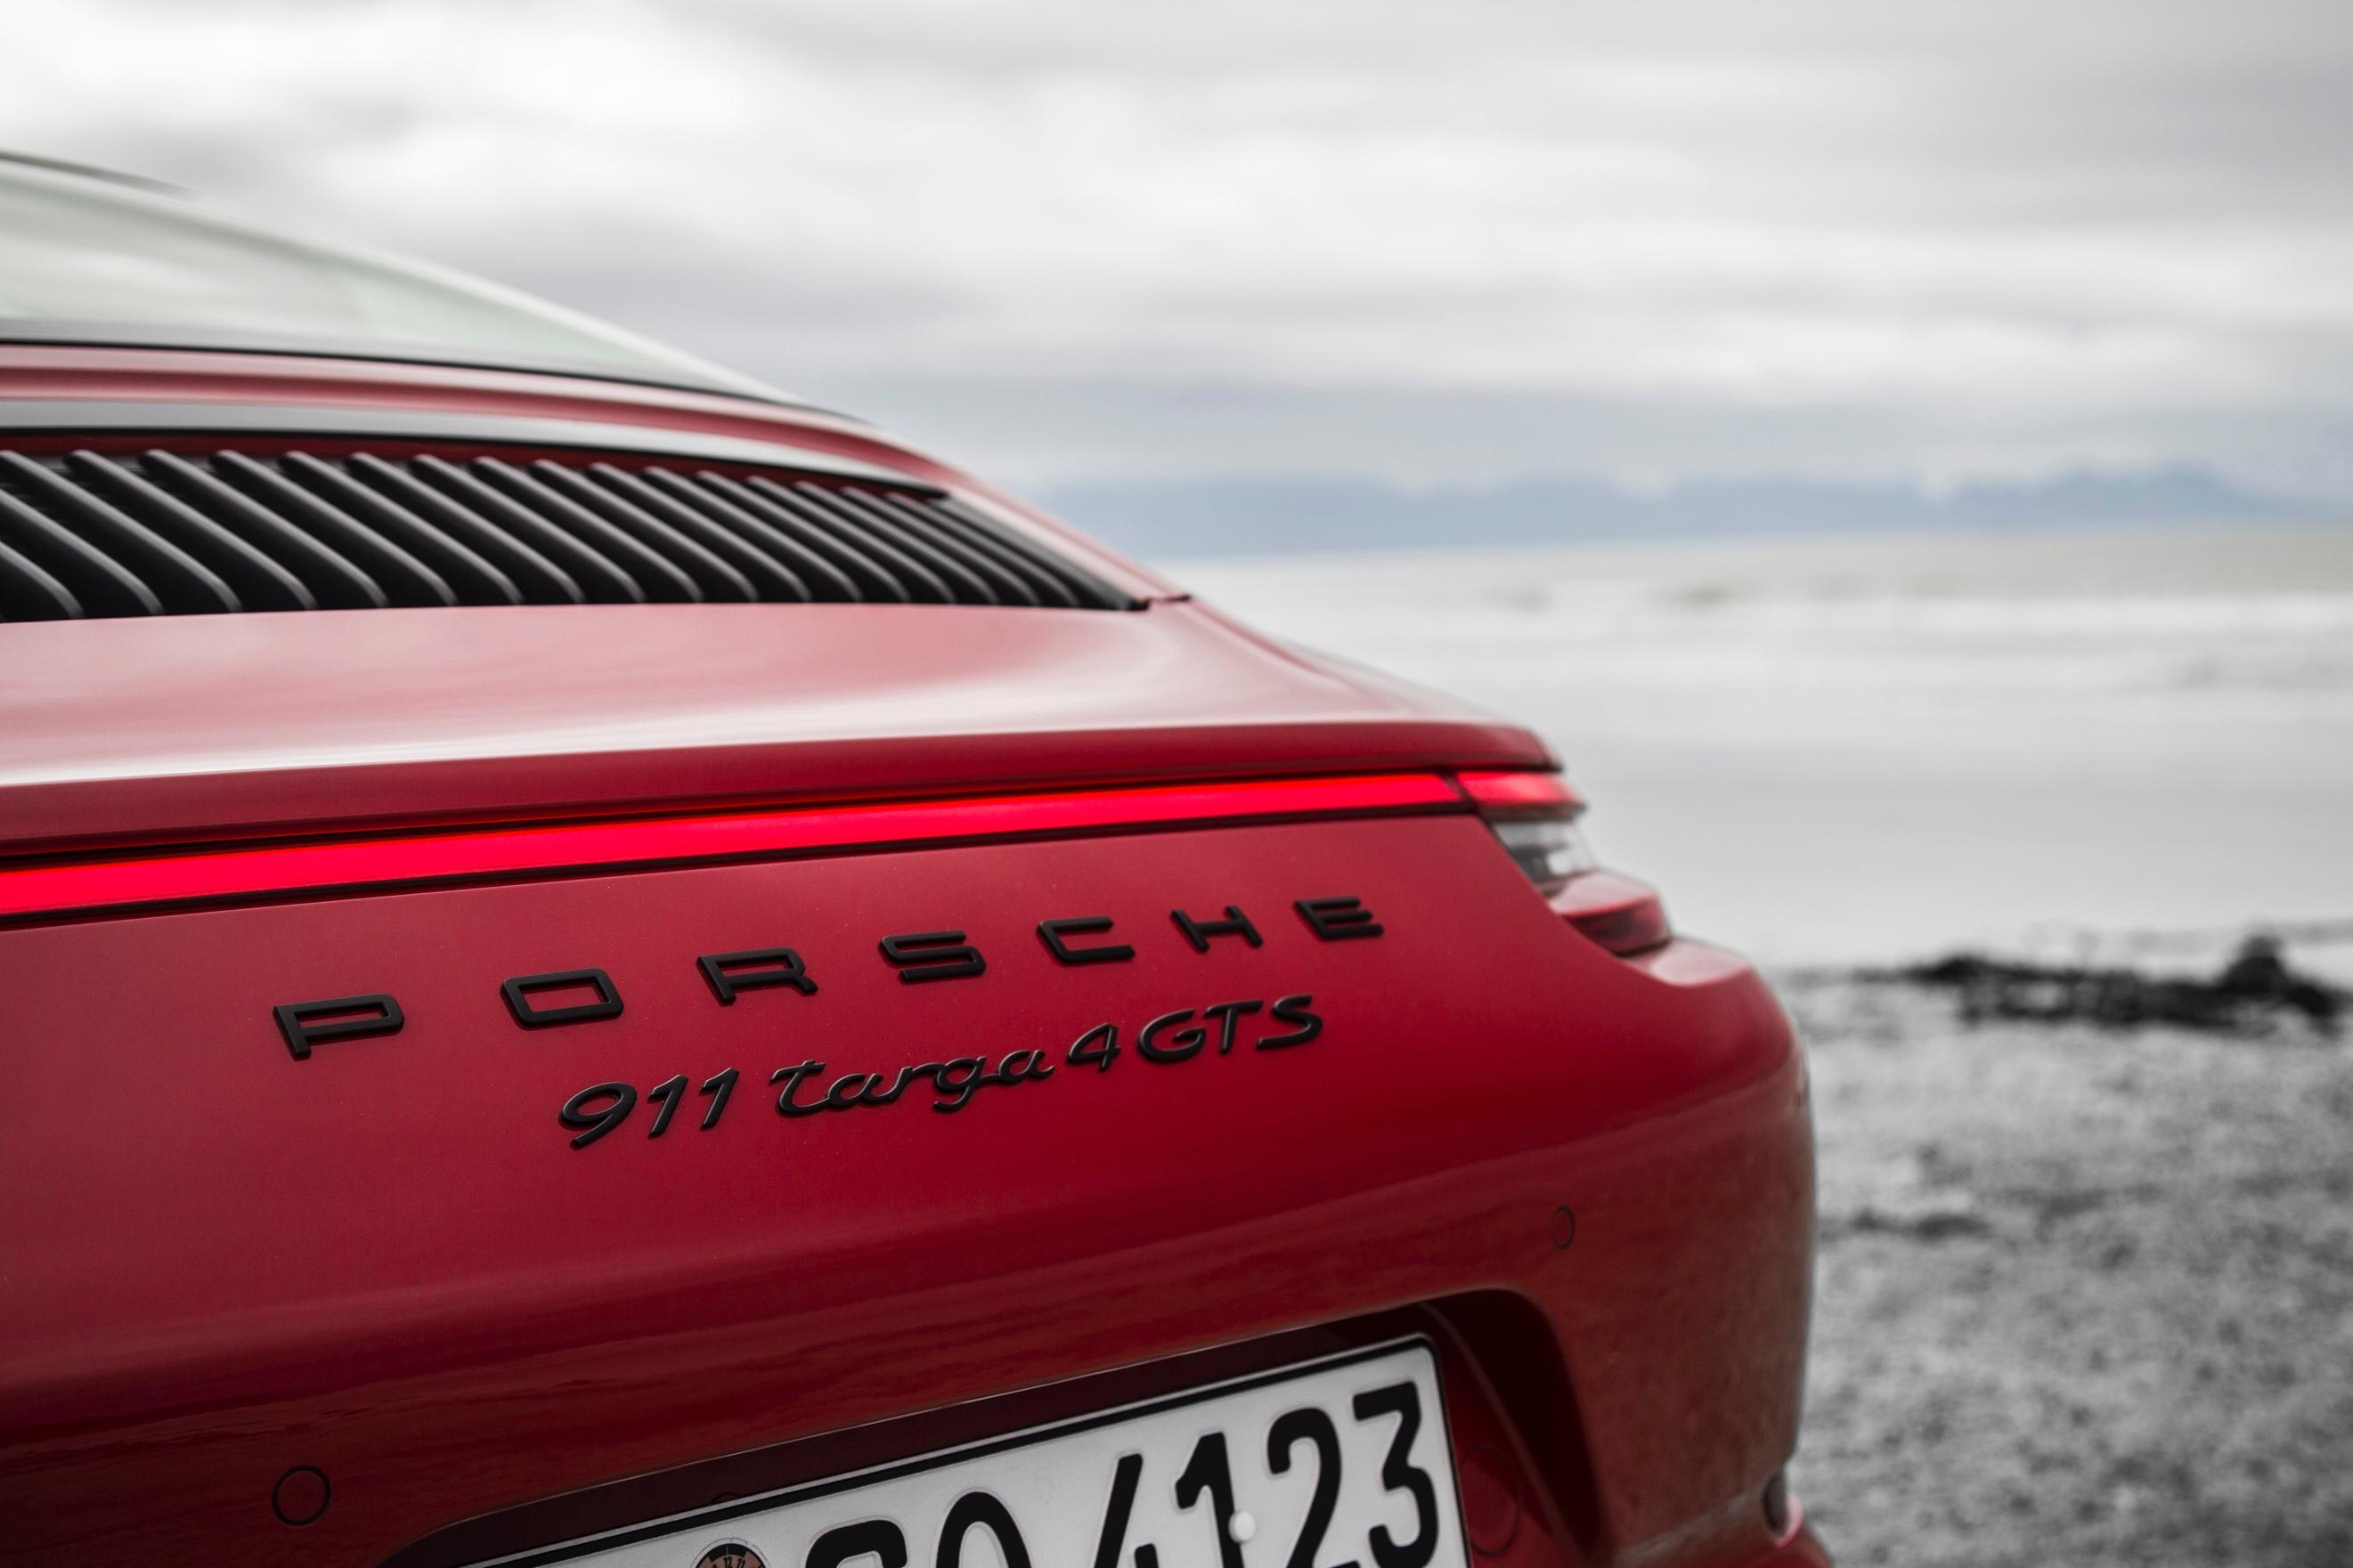 ../Porsche%20Press%20Kits/done/00003_911GTSLaunch/29r9687_high.jpg